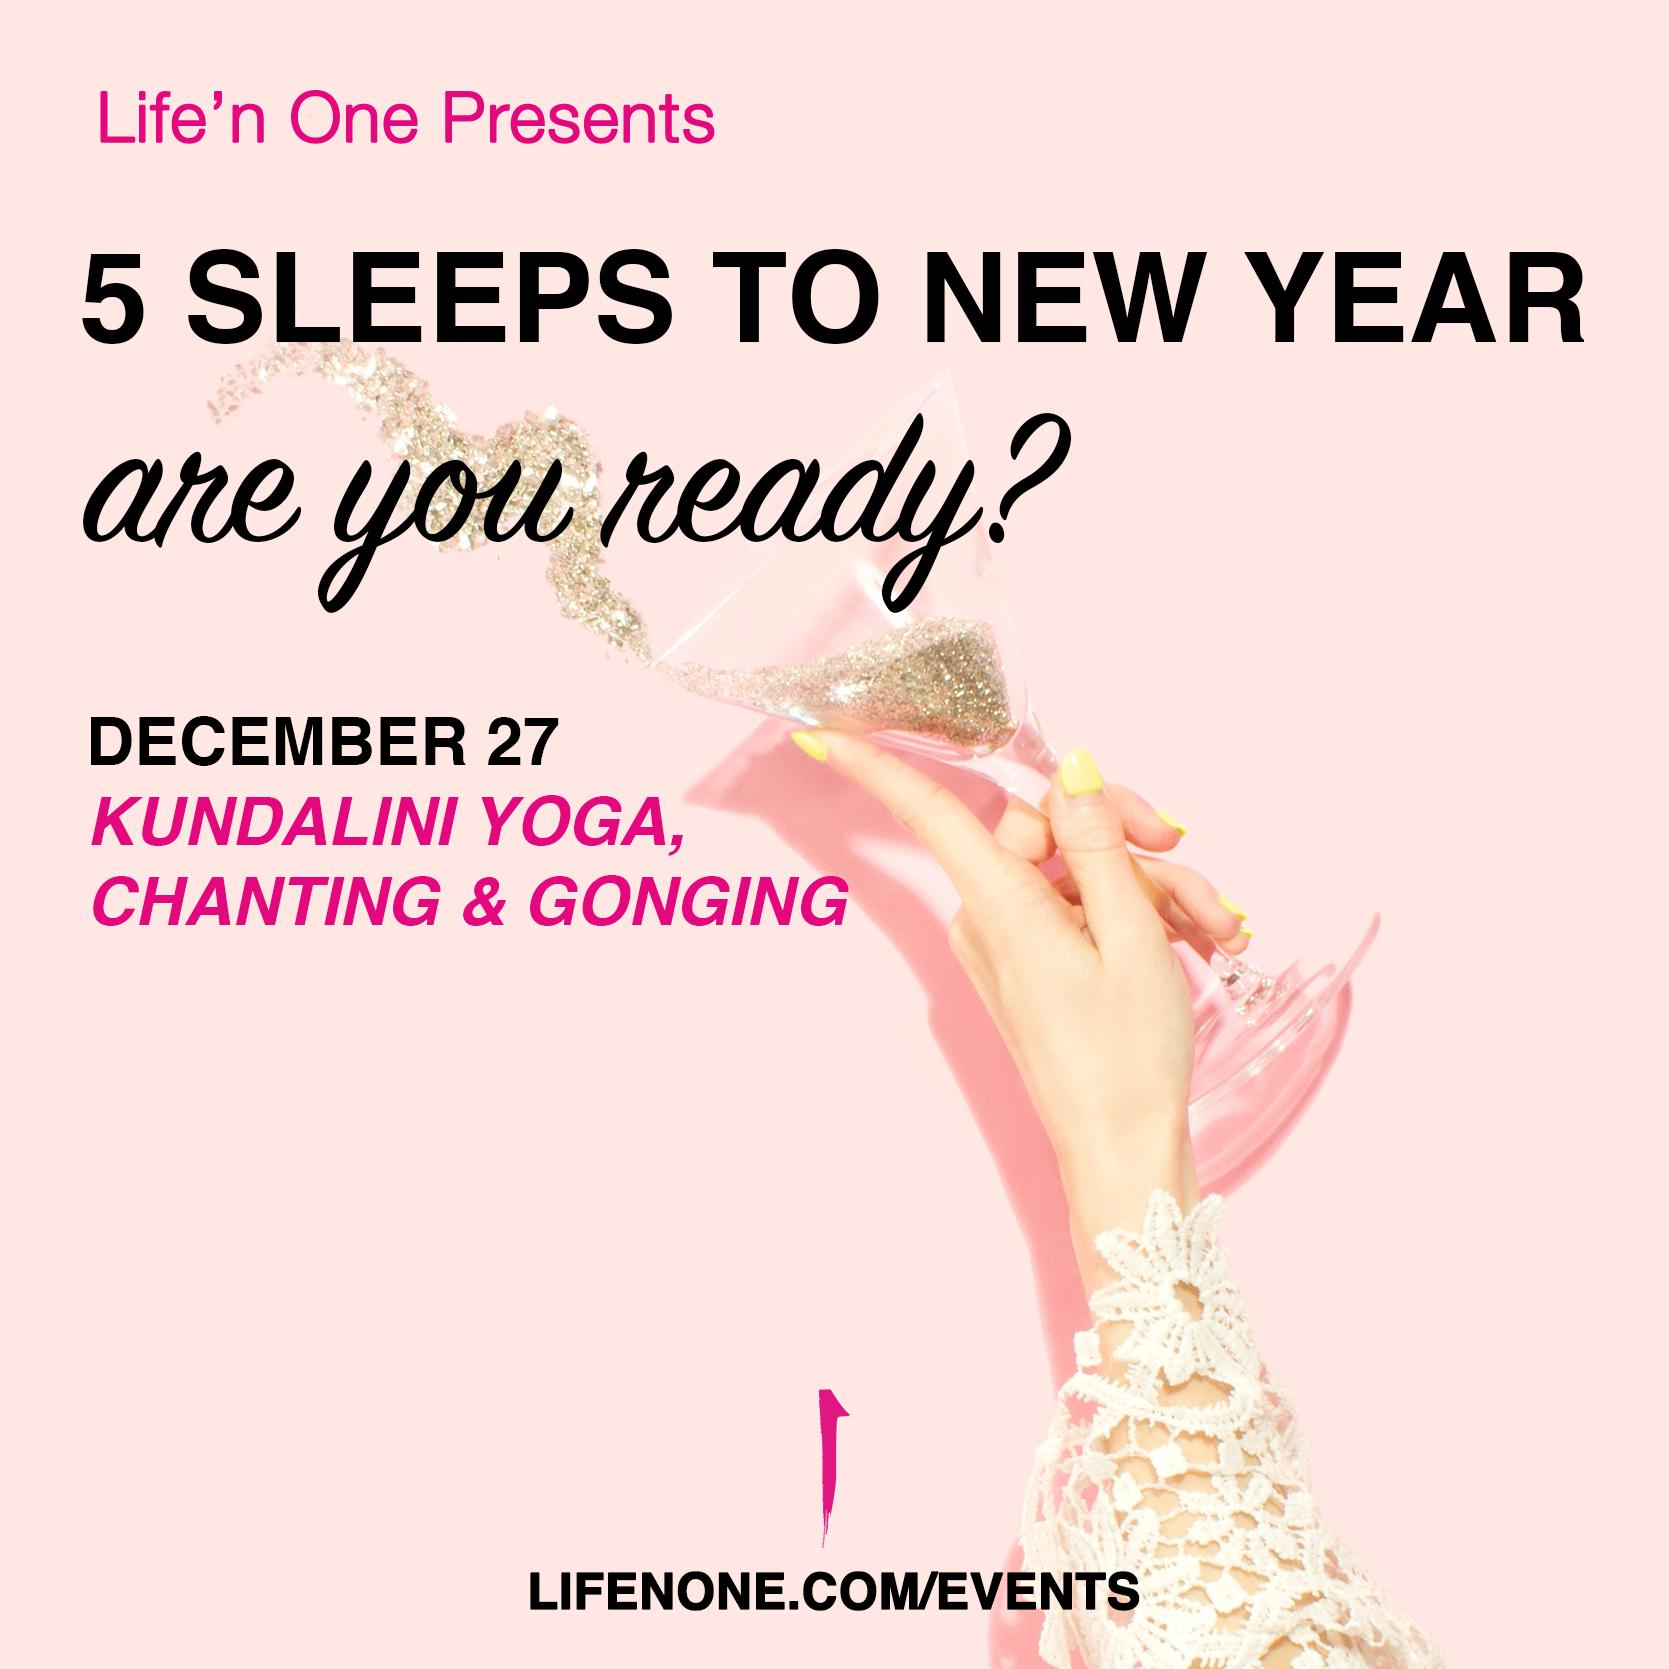 5 Sleeps to New Year - Are you Ready? // Kundalini Yoga, Chanting & Gonging